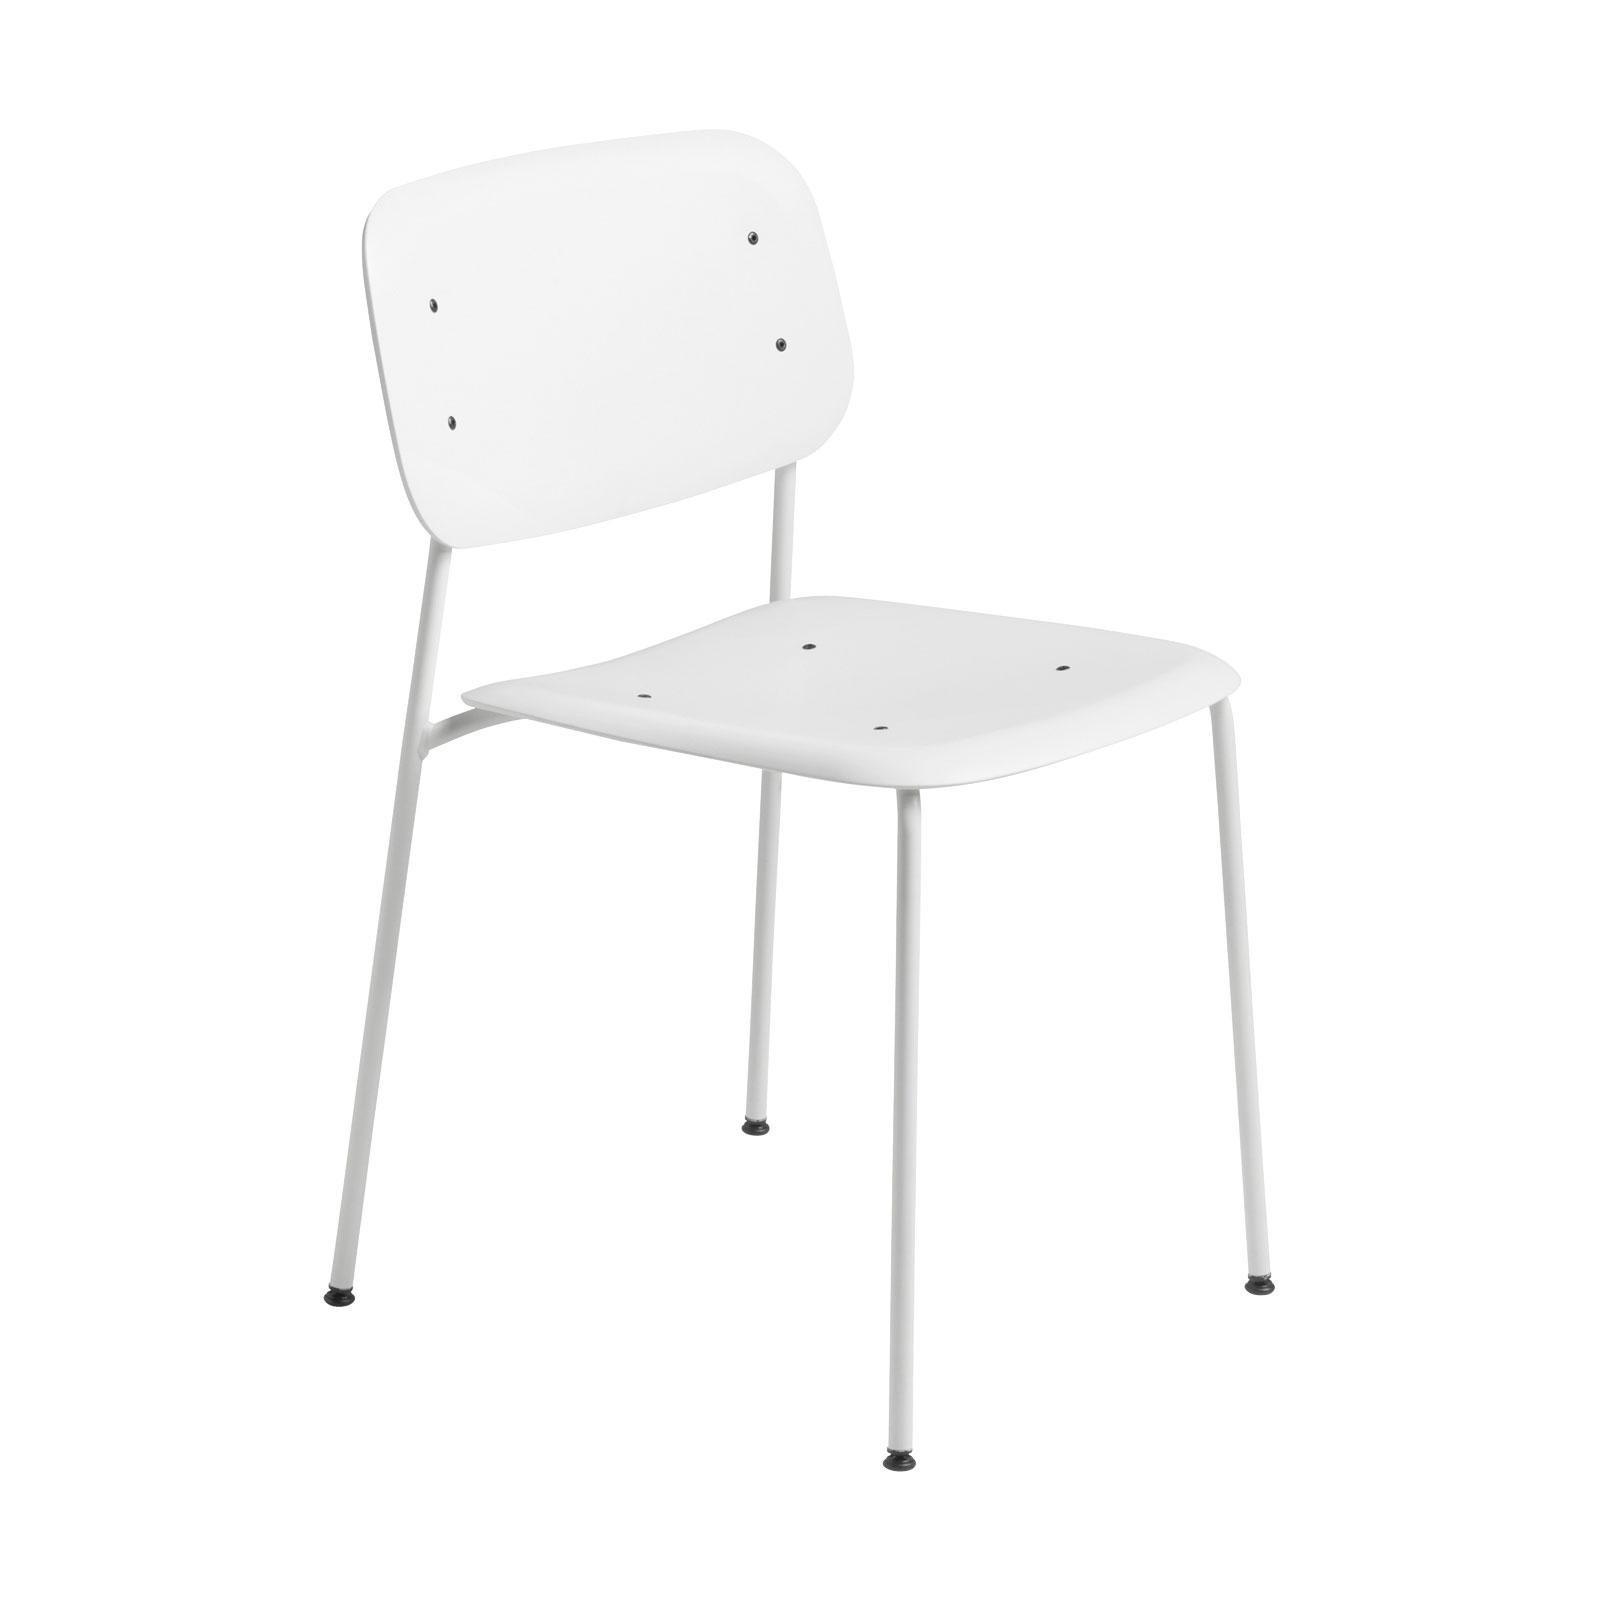 Edge Soft Stahl P10 Gestell Stuhl Weiß vm8PyO0nwN